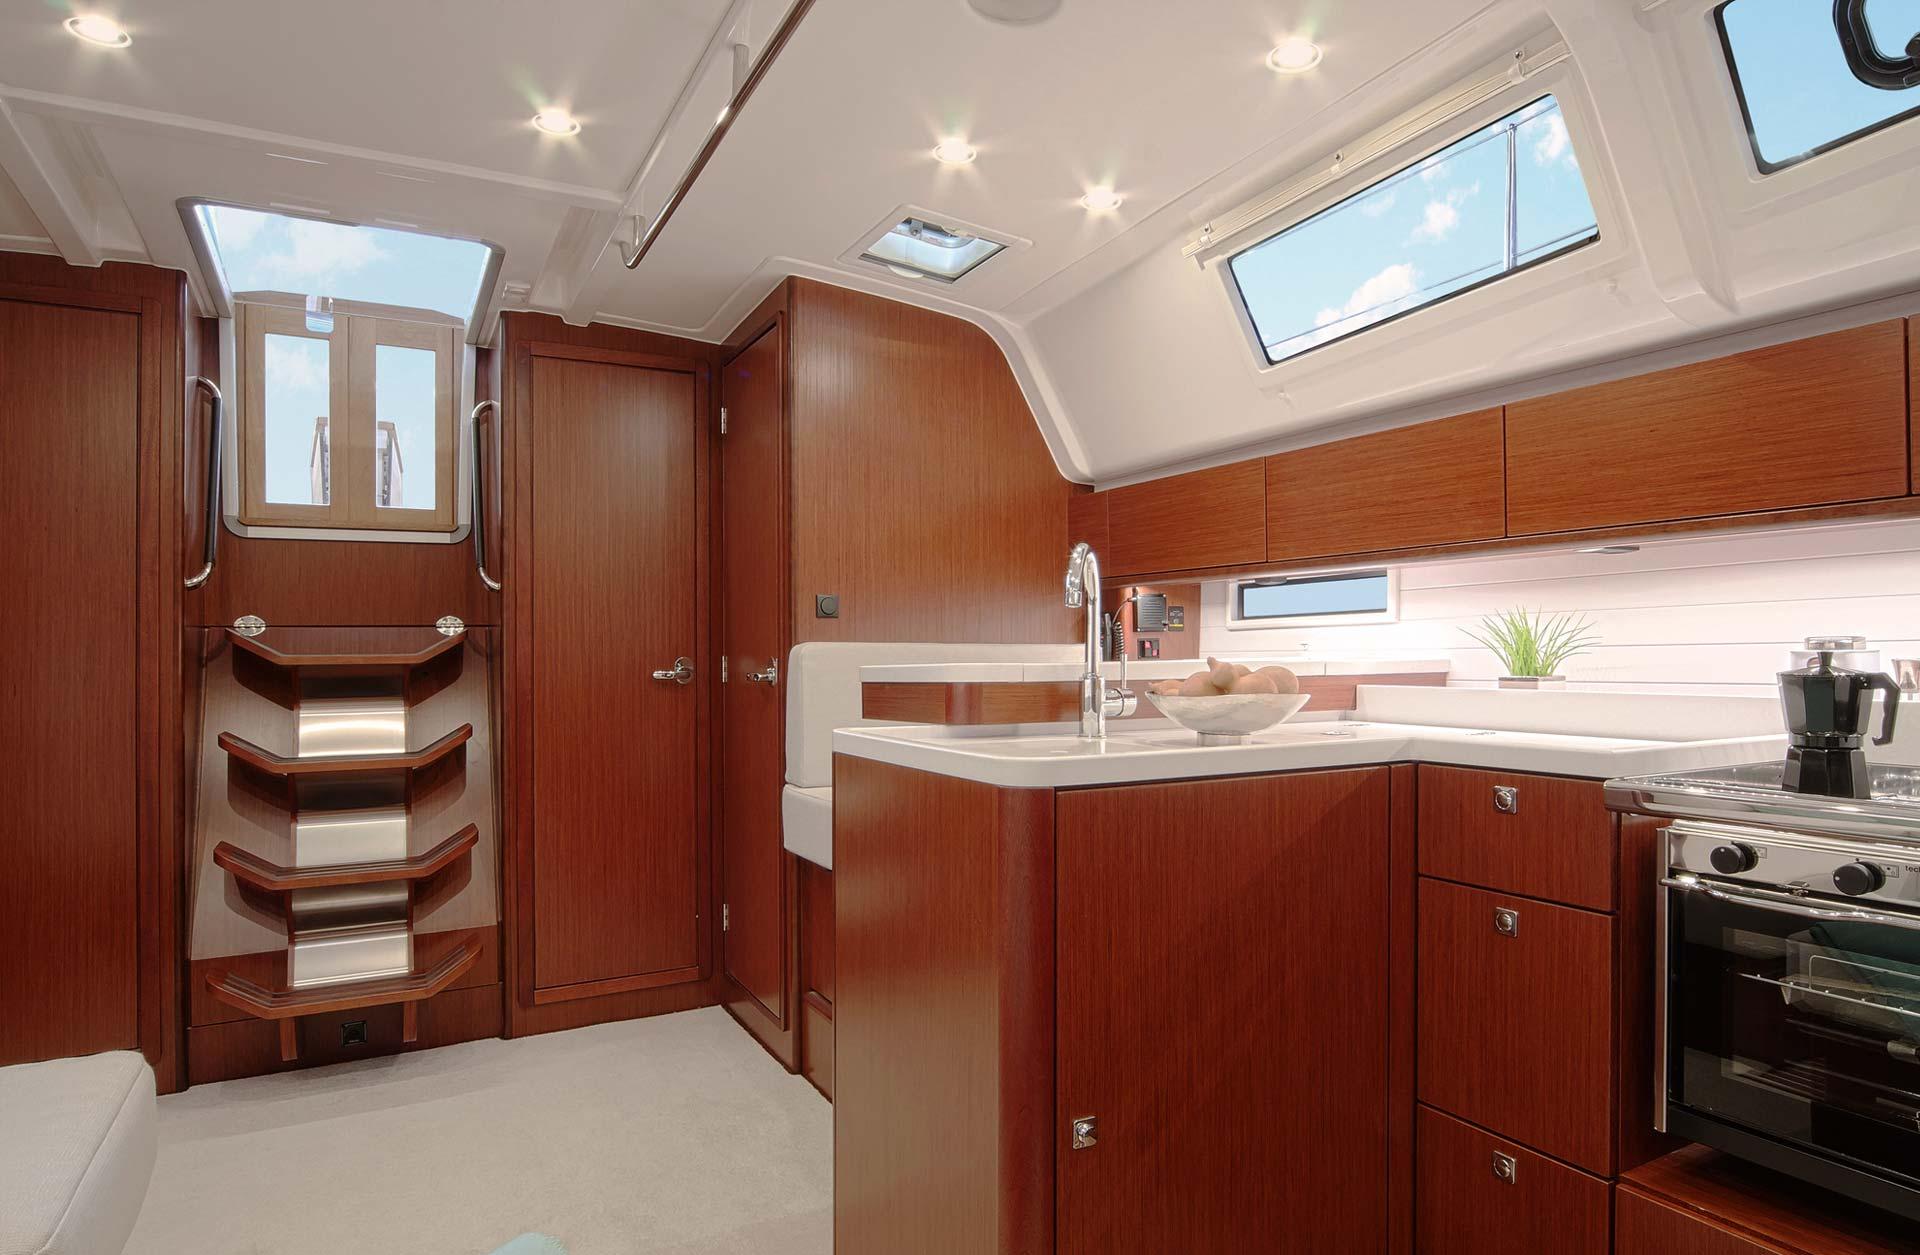 2018 Bavaria Cruiser 51 Style - Interior